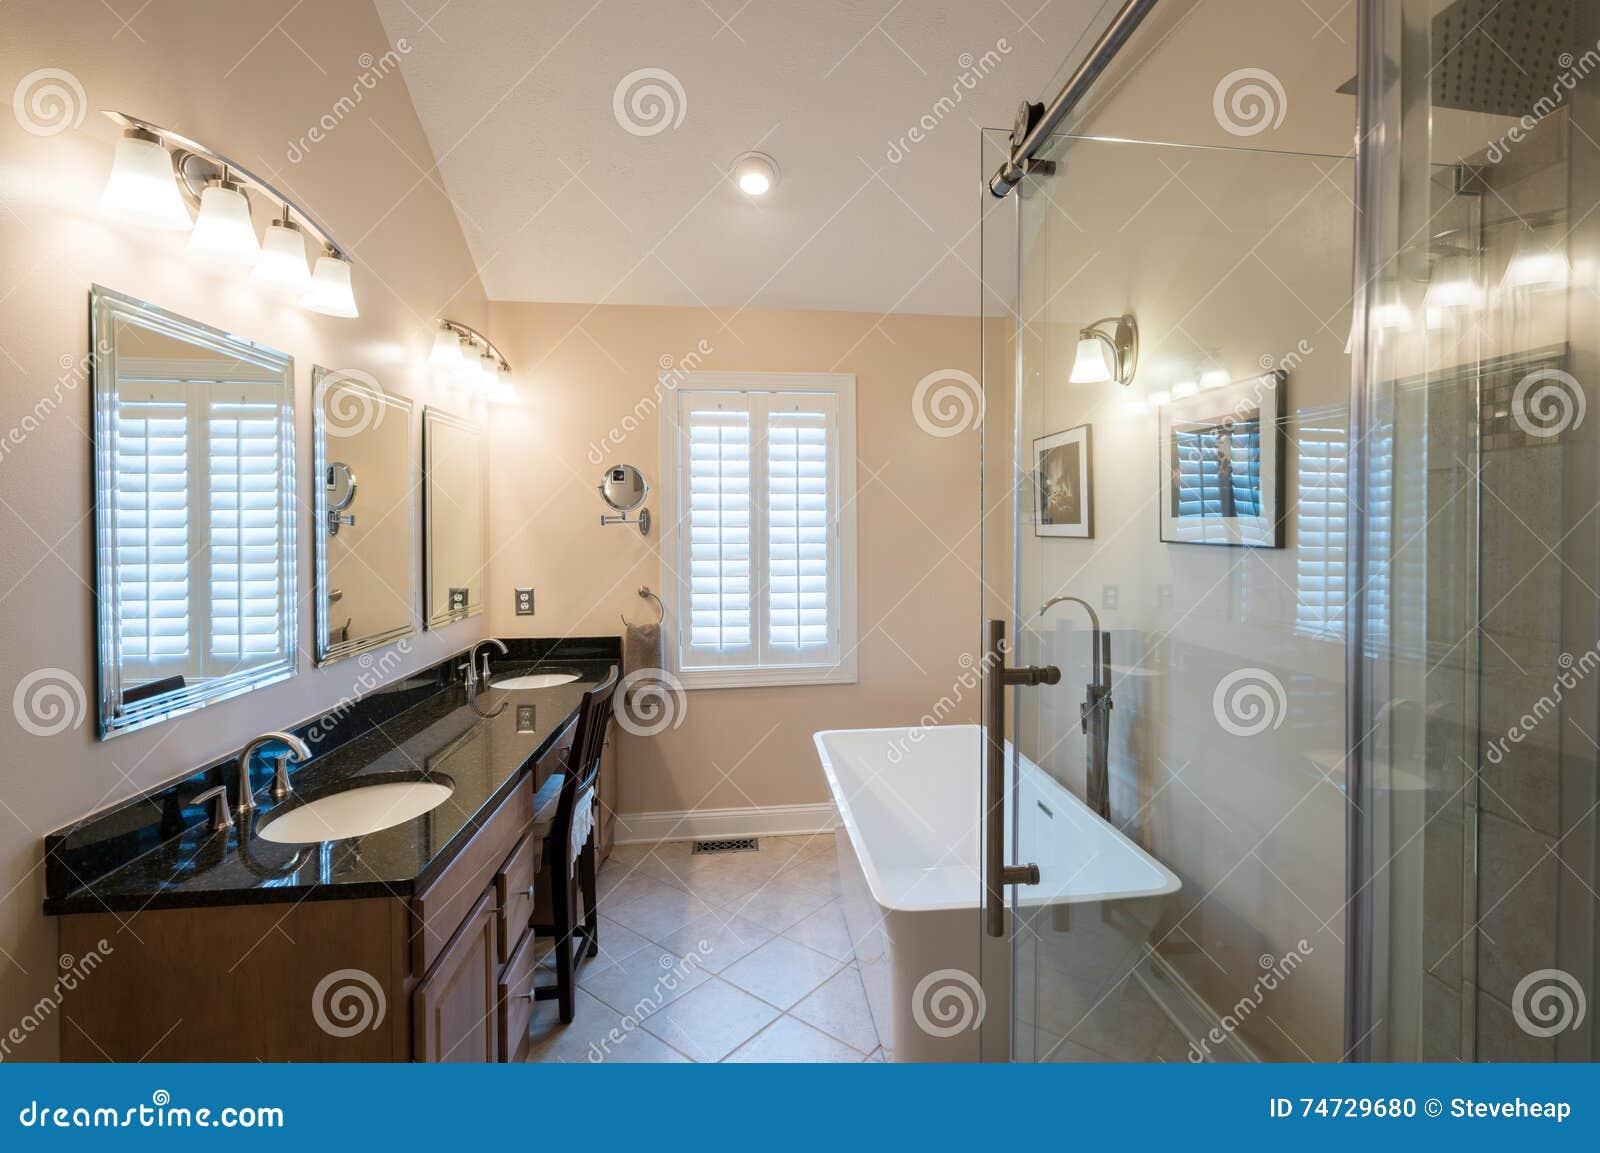 Bagno moderno con vasca doccia vetro u foto stock weezybob